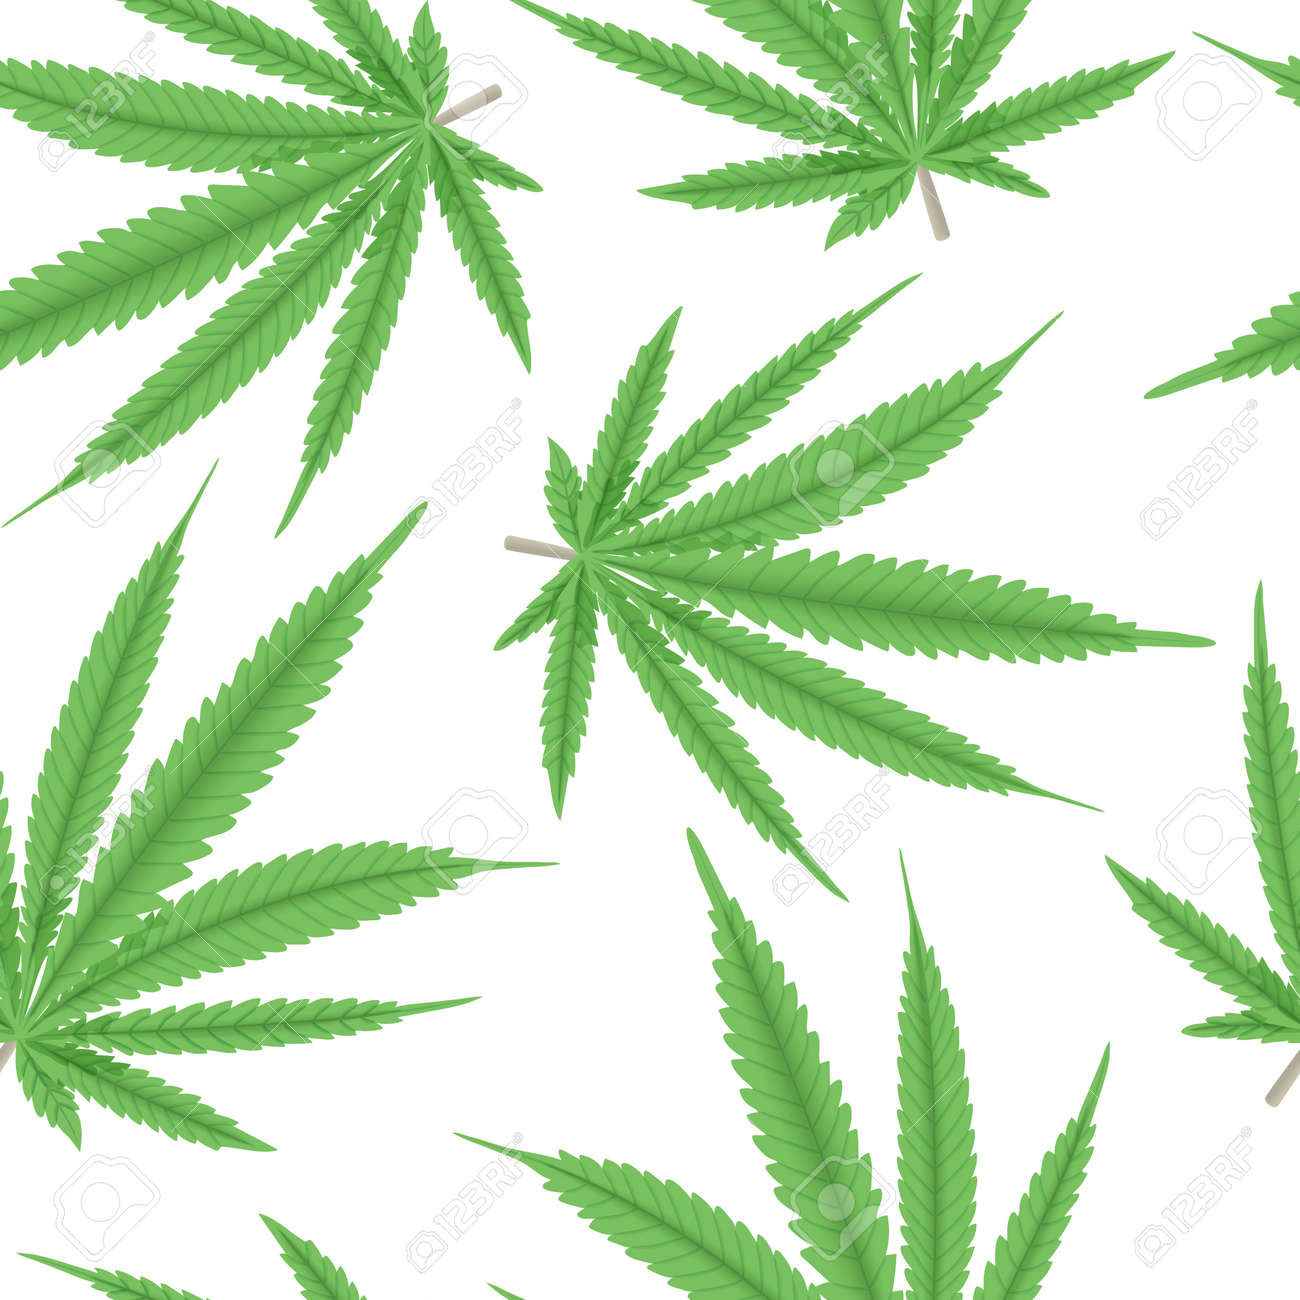 Cannabis green leaf seamless pattern vector illustration. Hemp plant. For medicine, textile, clothing, cordage, fibre, - 156602247